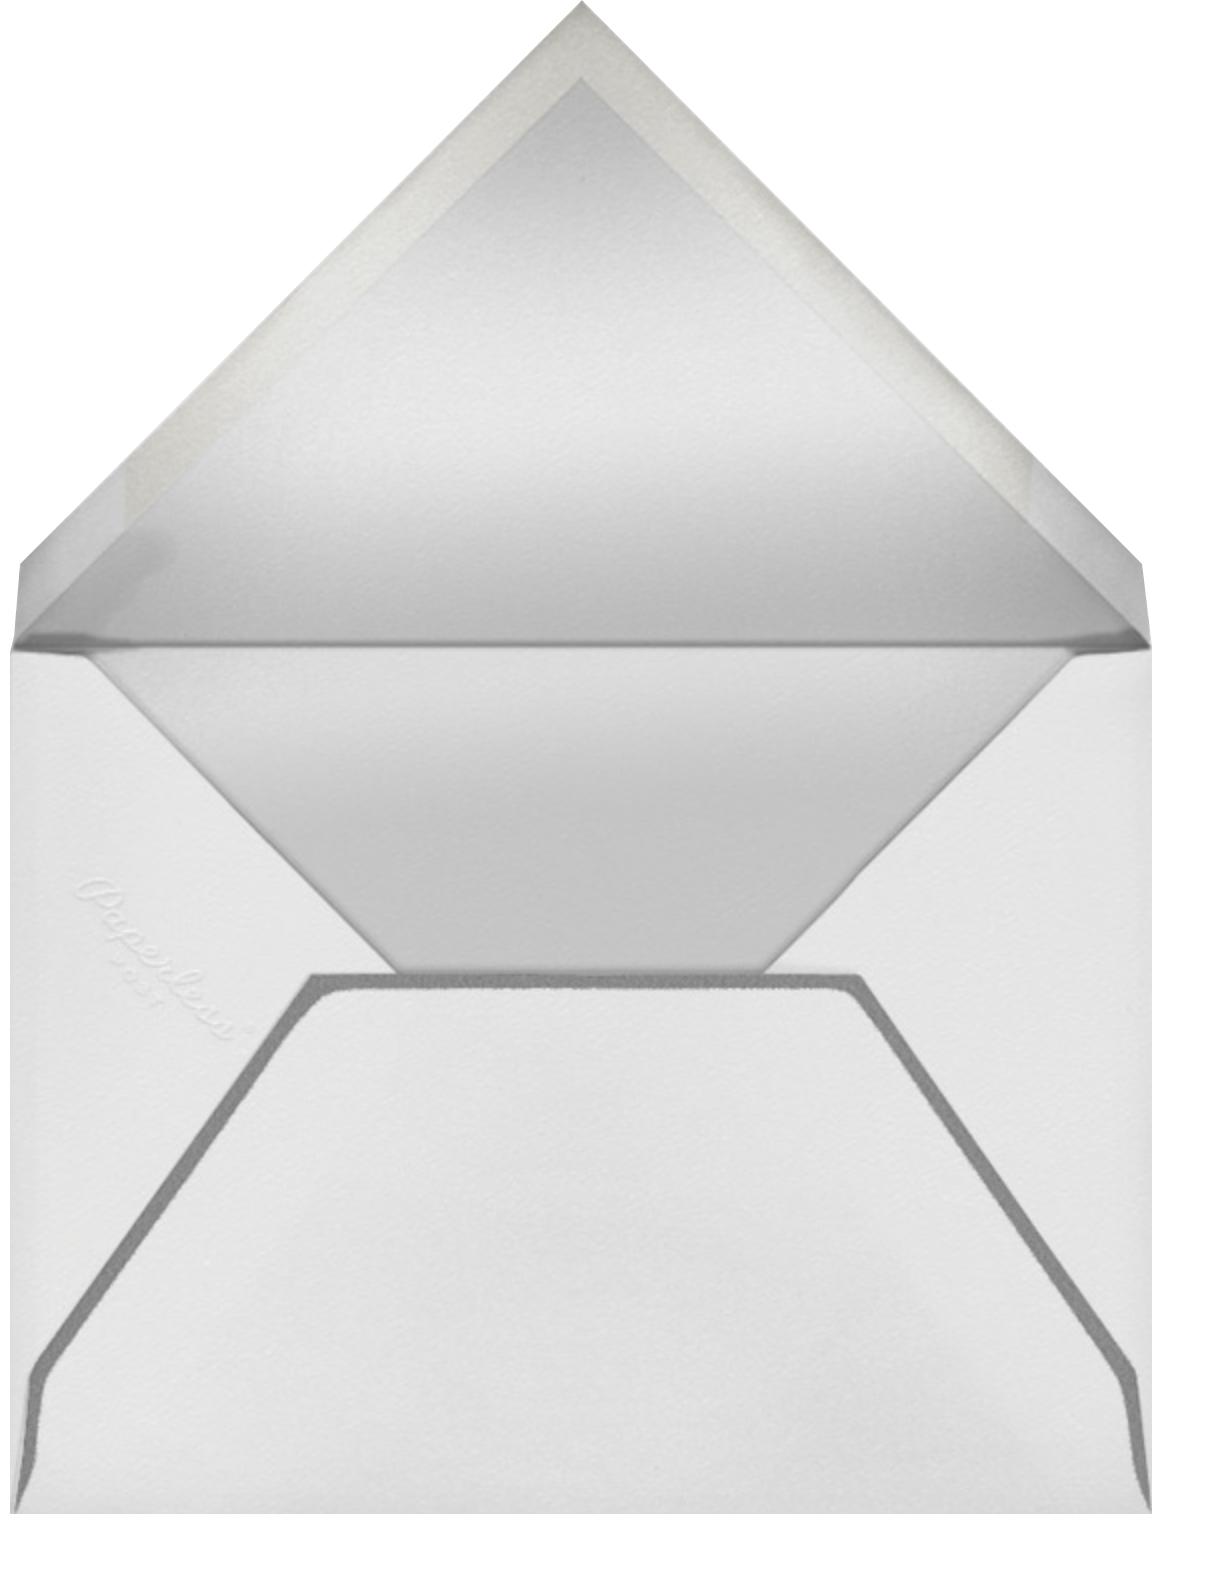 Wise Ass - Paperless Post - Graduation - envelope back